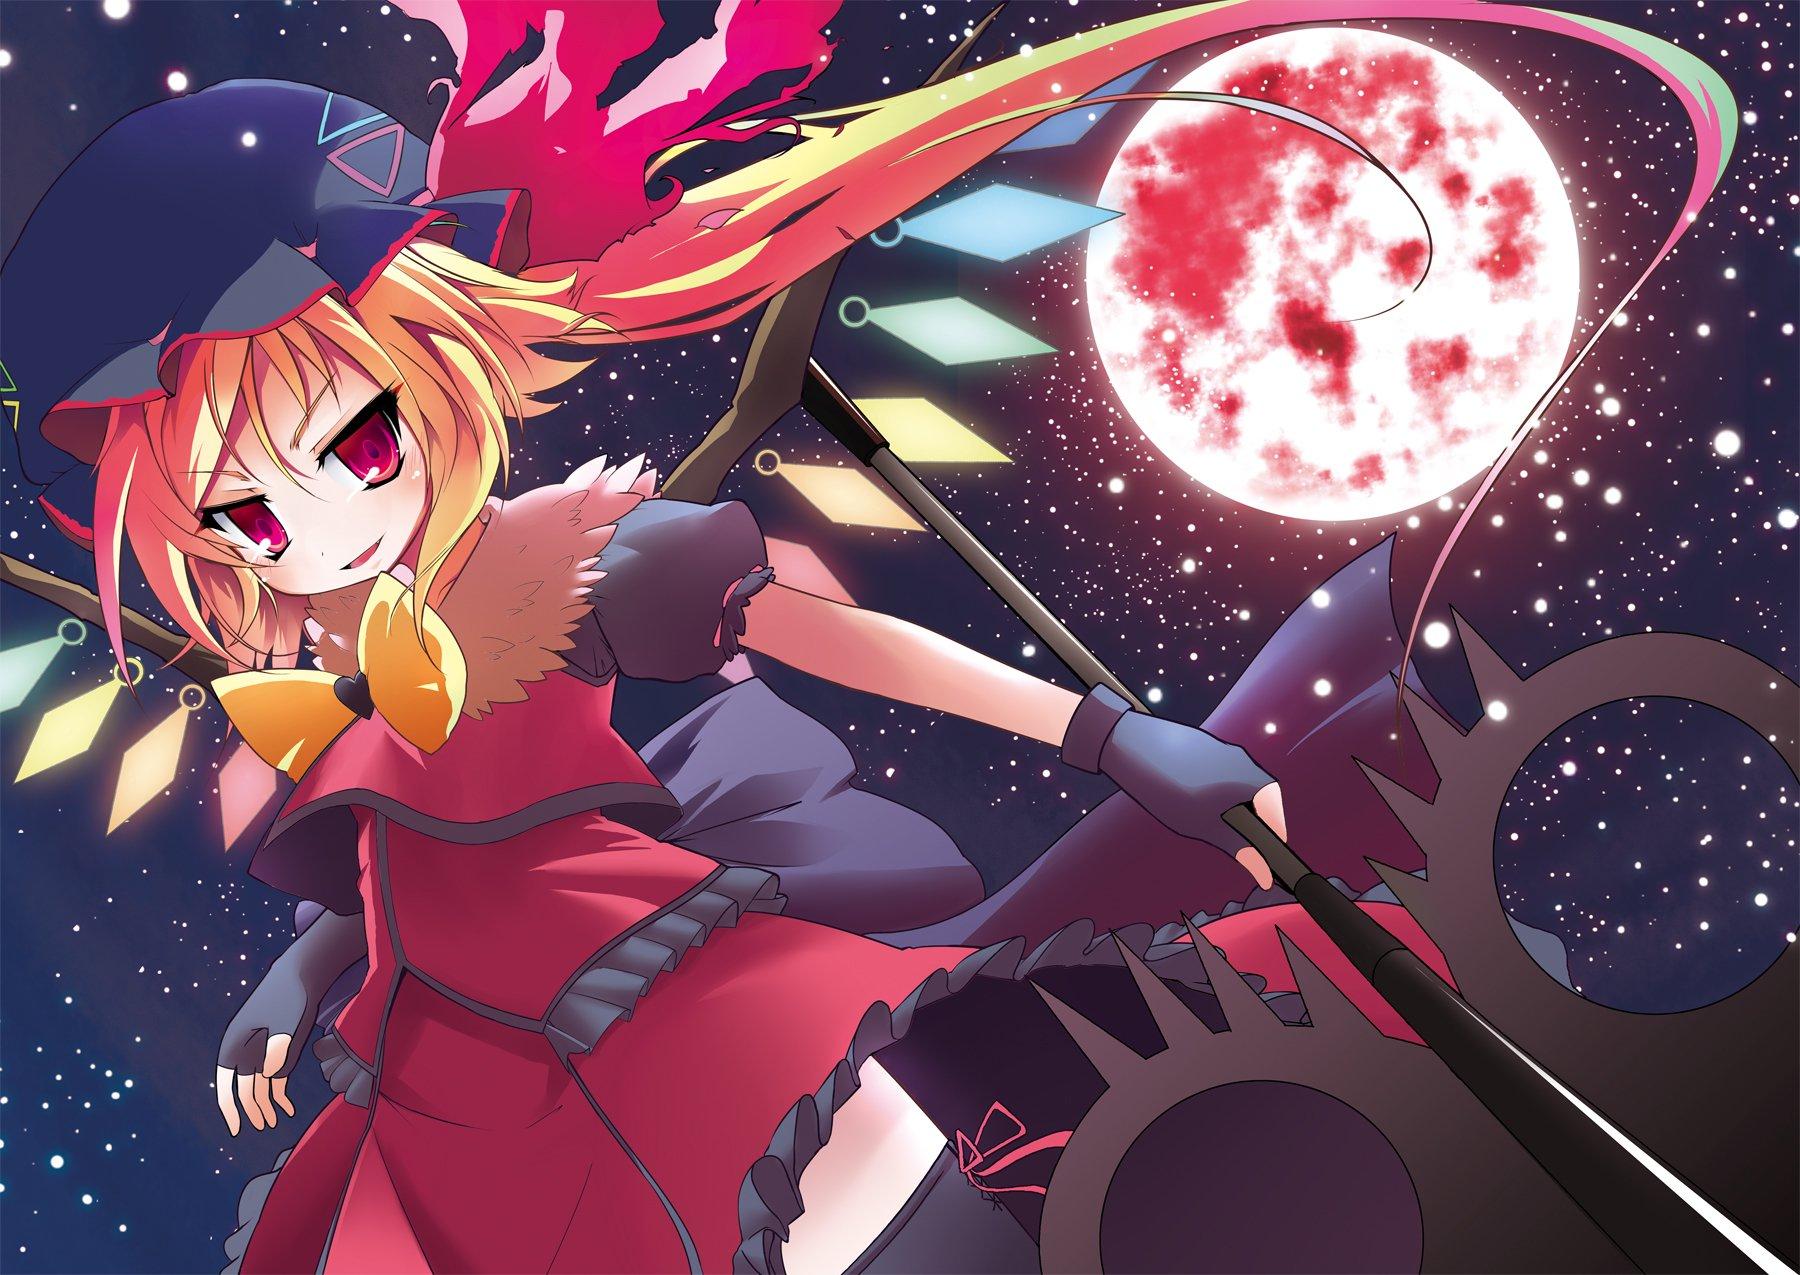 Anime - Touhou  Flandre Scarlet Wings Staff Moon Vampire Wallpaper